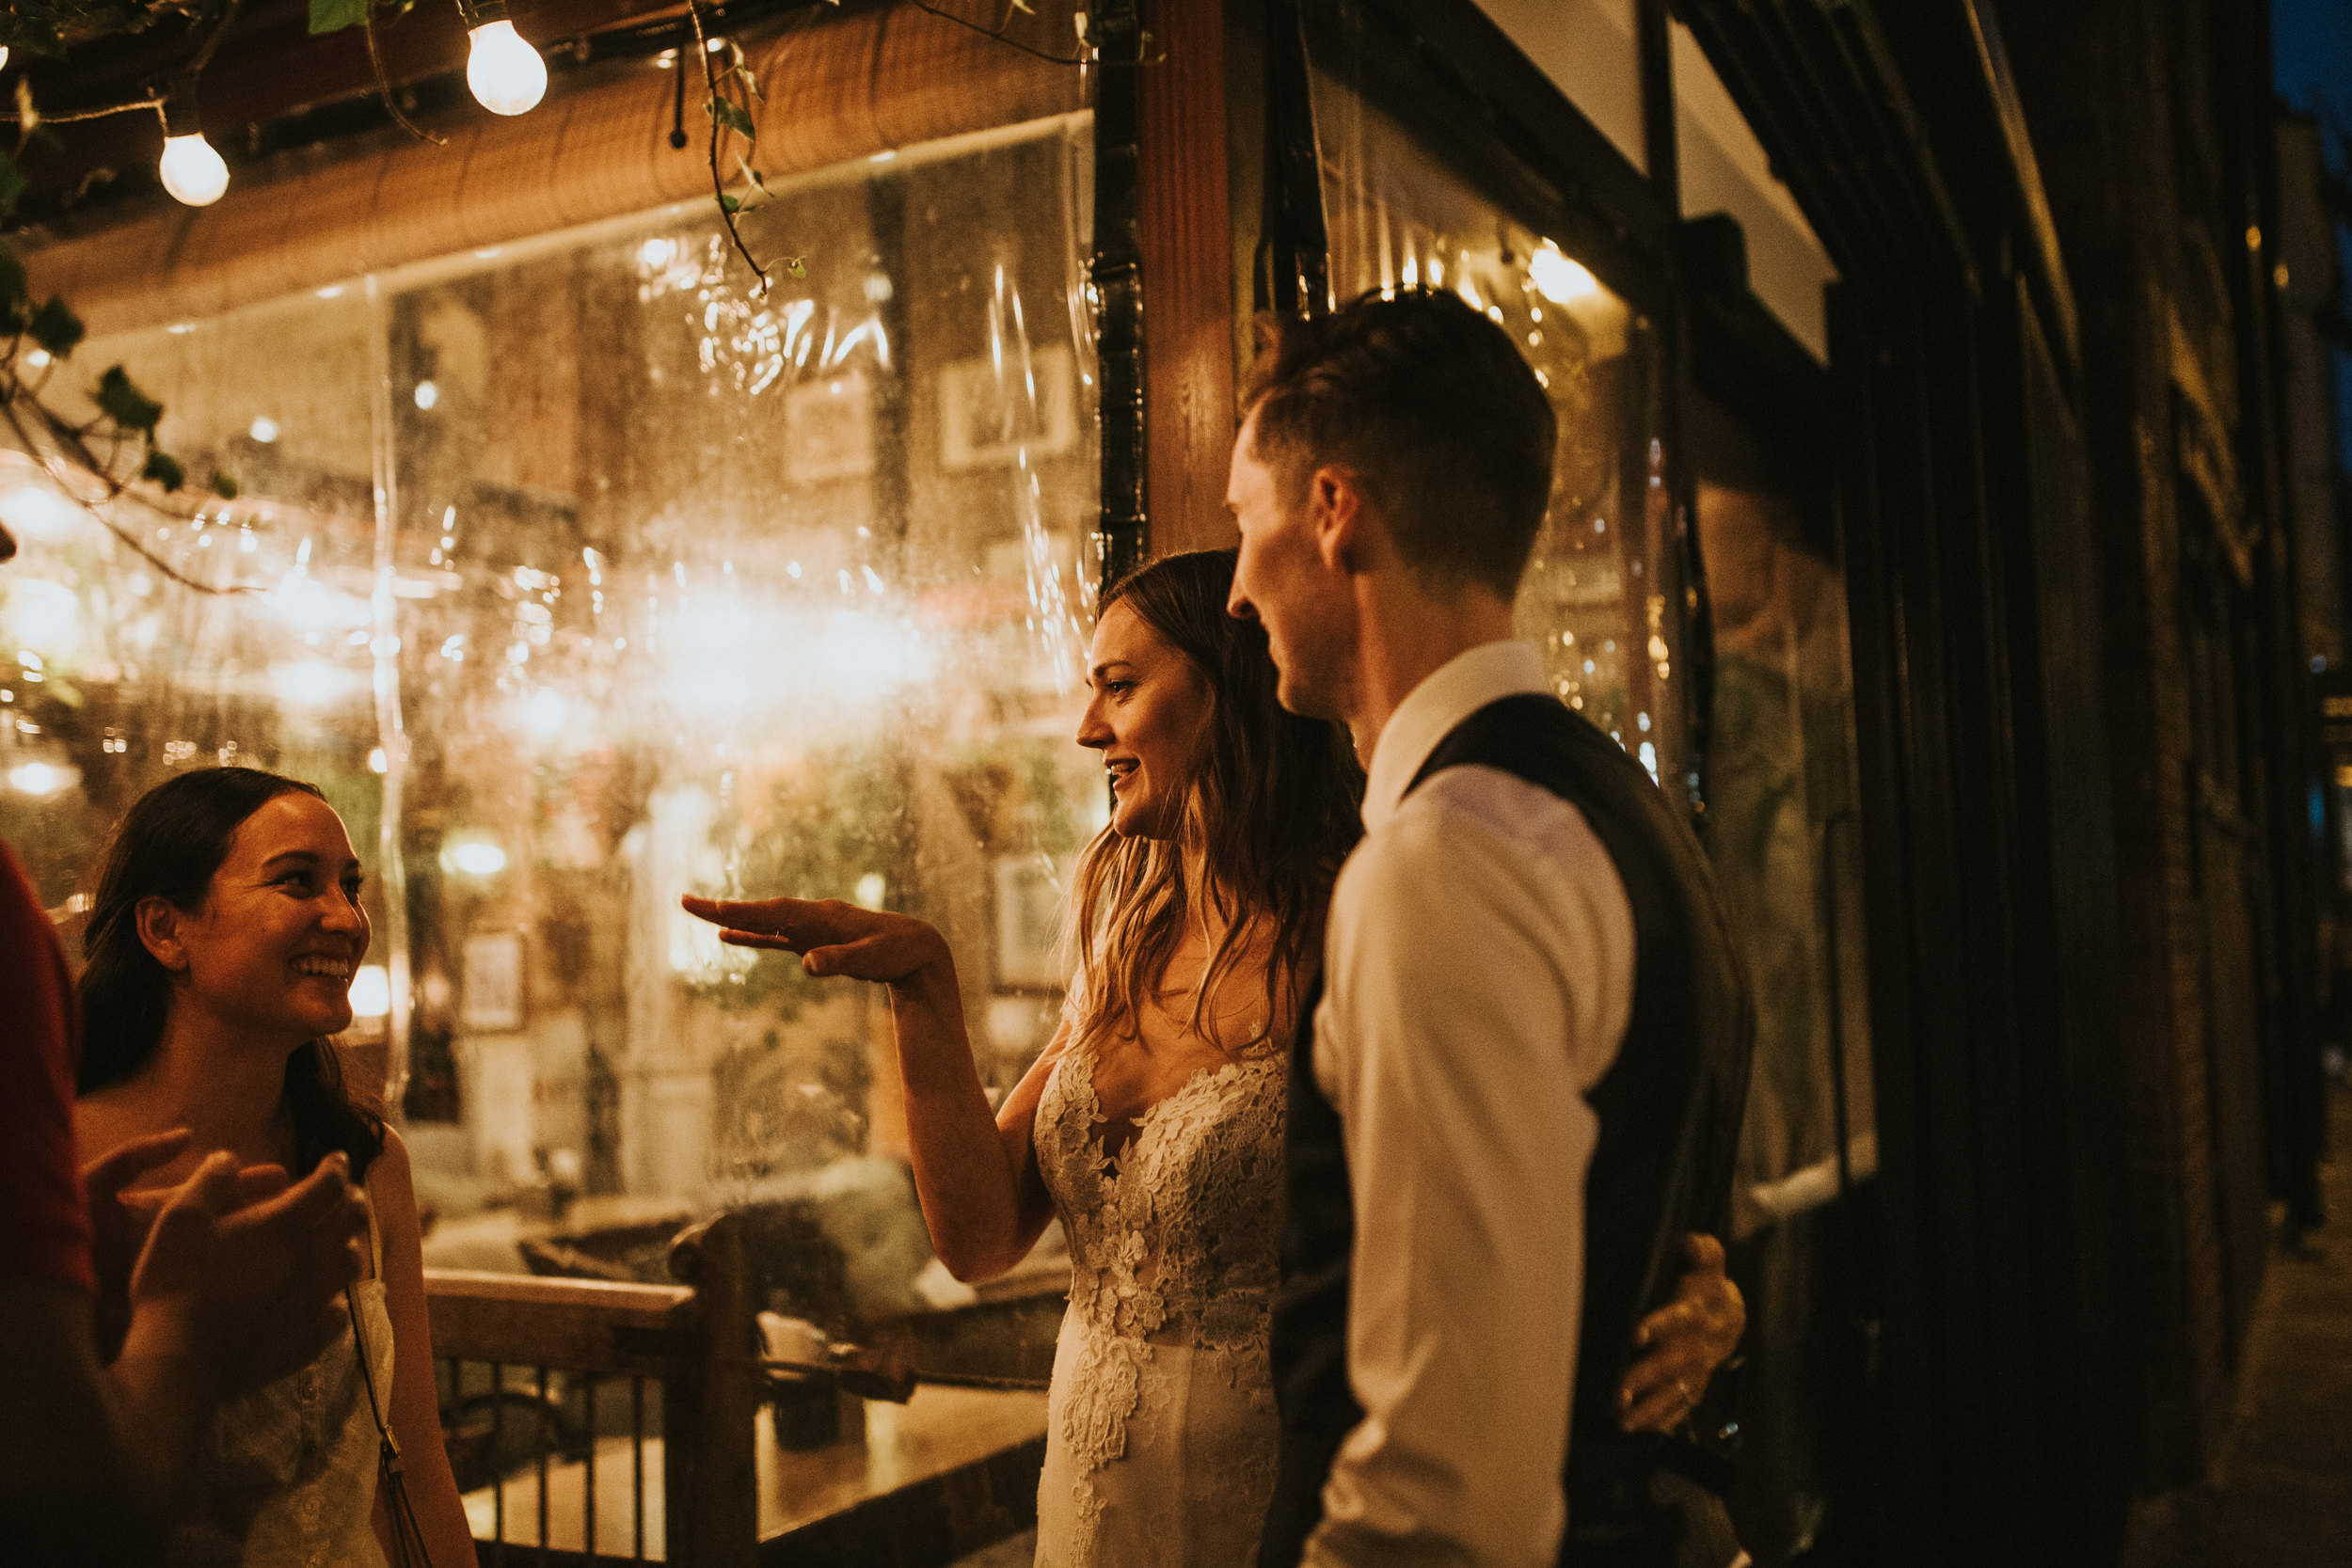 Laura-Benn-The-Asylum-London-The-Ace-Hotel-Wedding-Alternative-Darina-Stoda-Photography-815.jpg